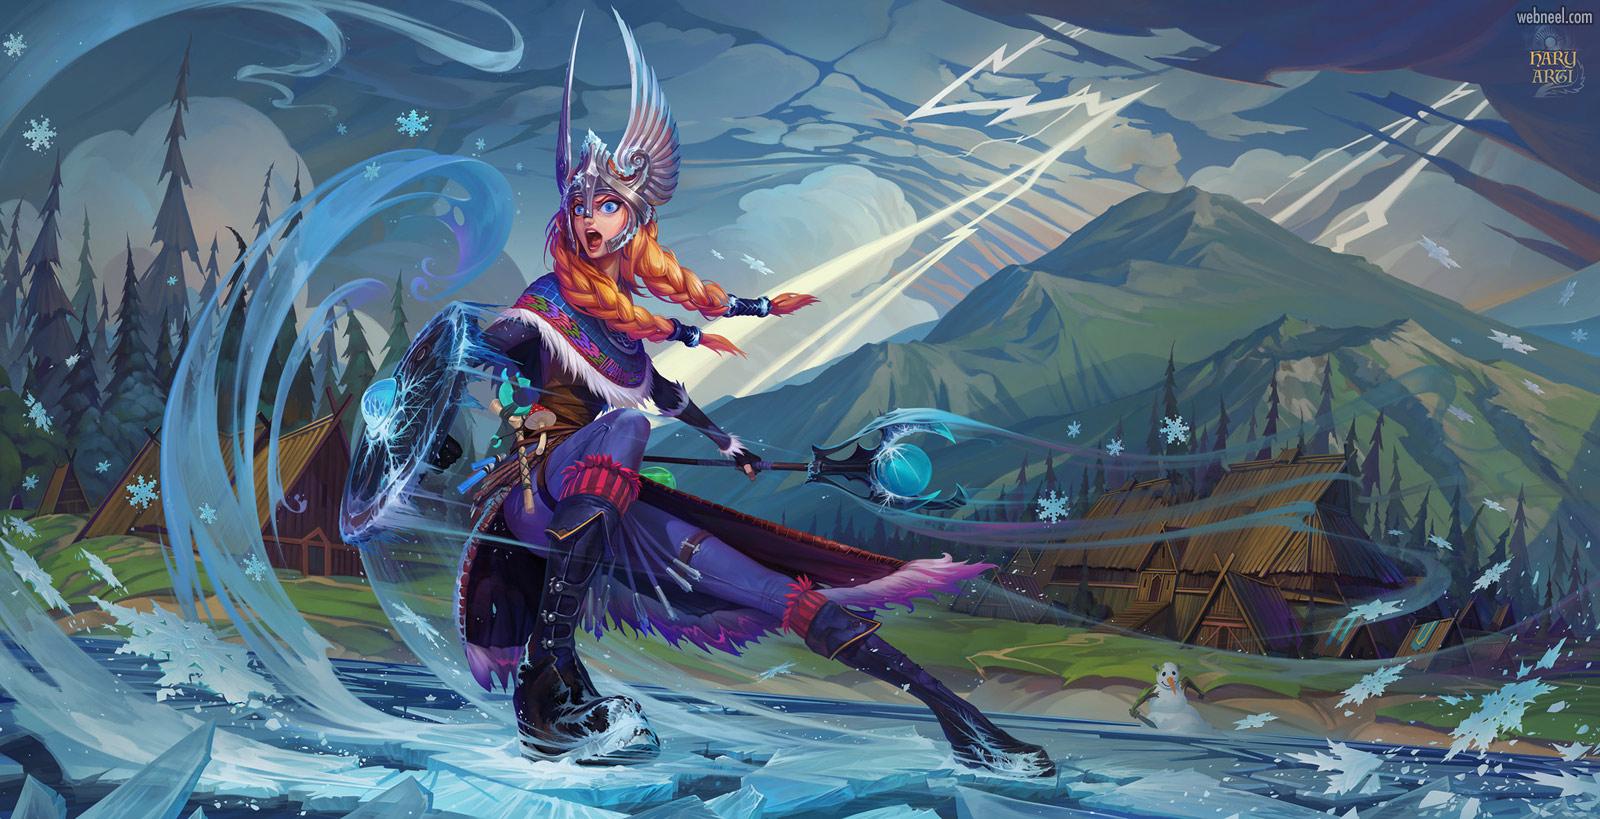 2d concept artwork warrior by igor artyomenko